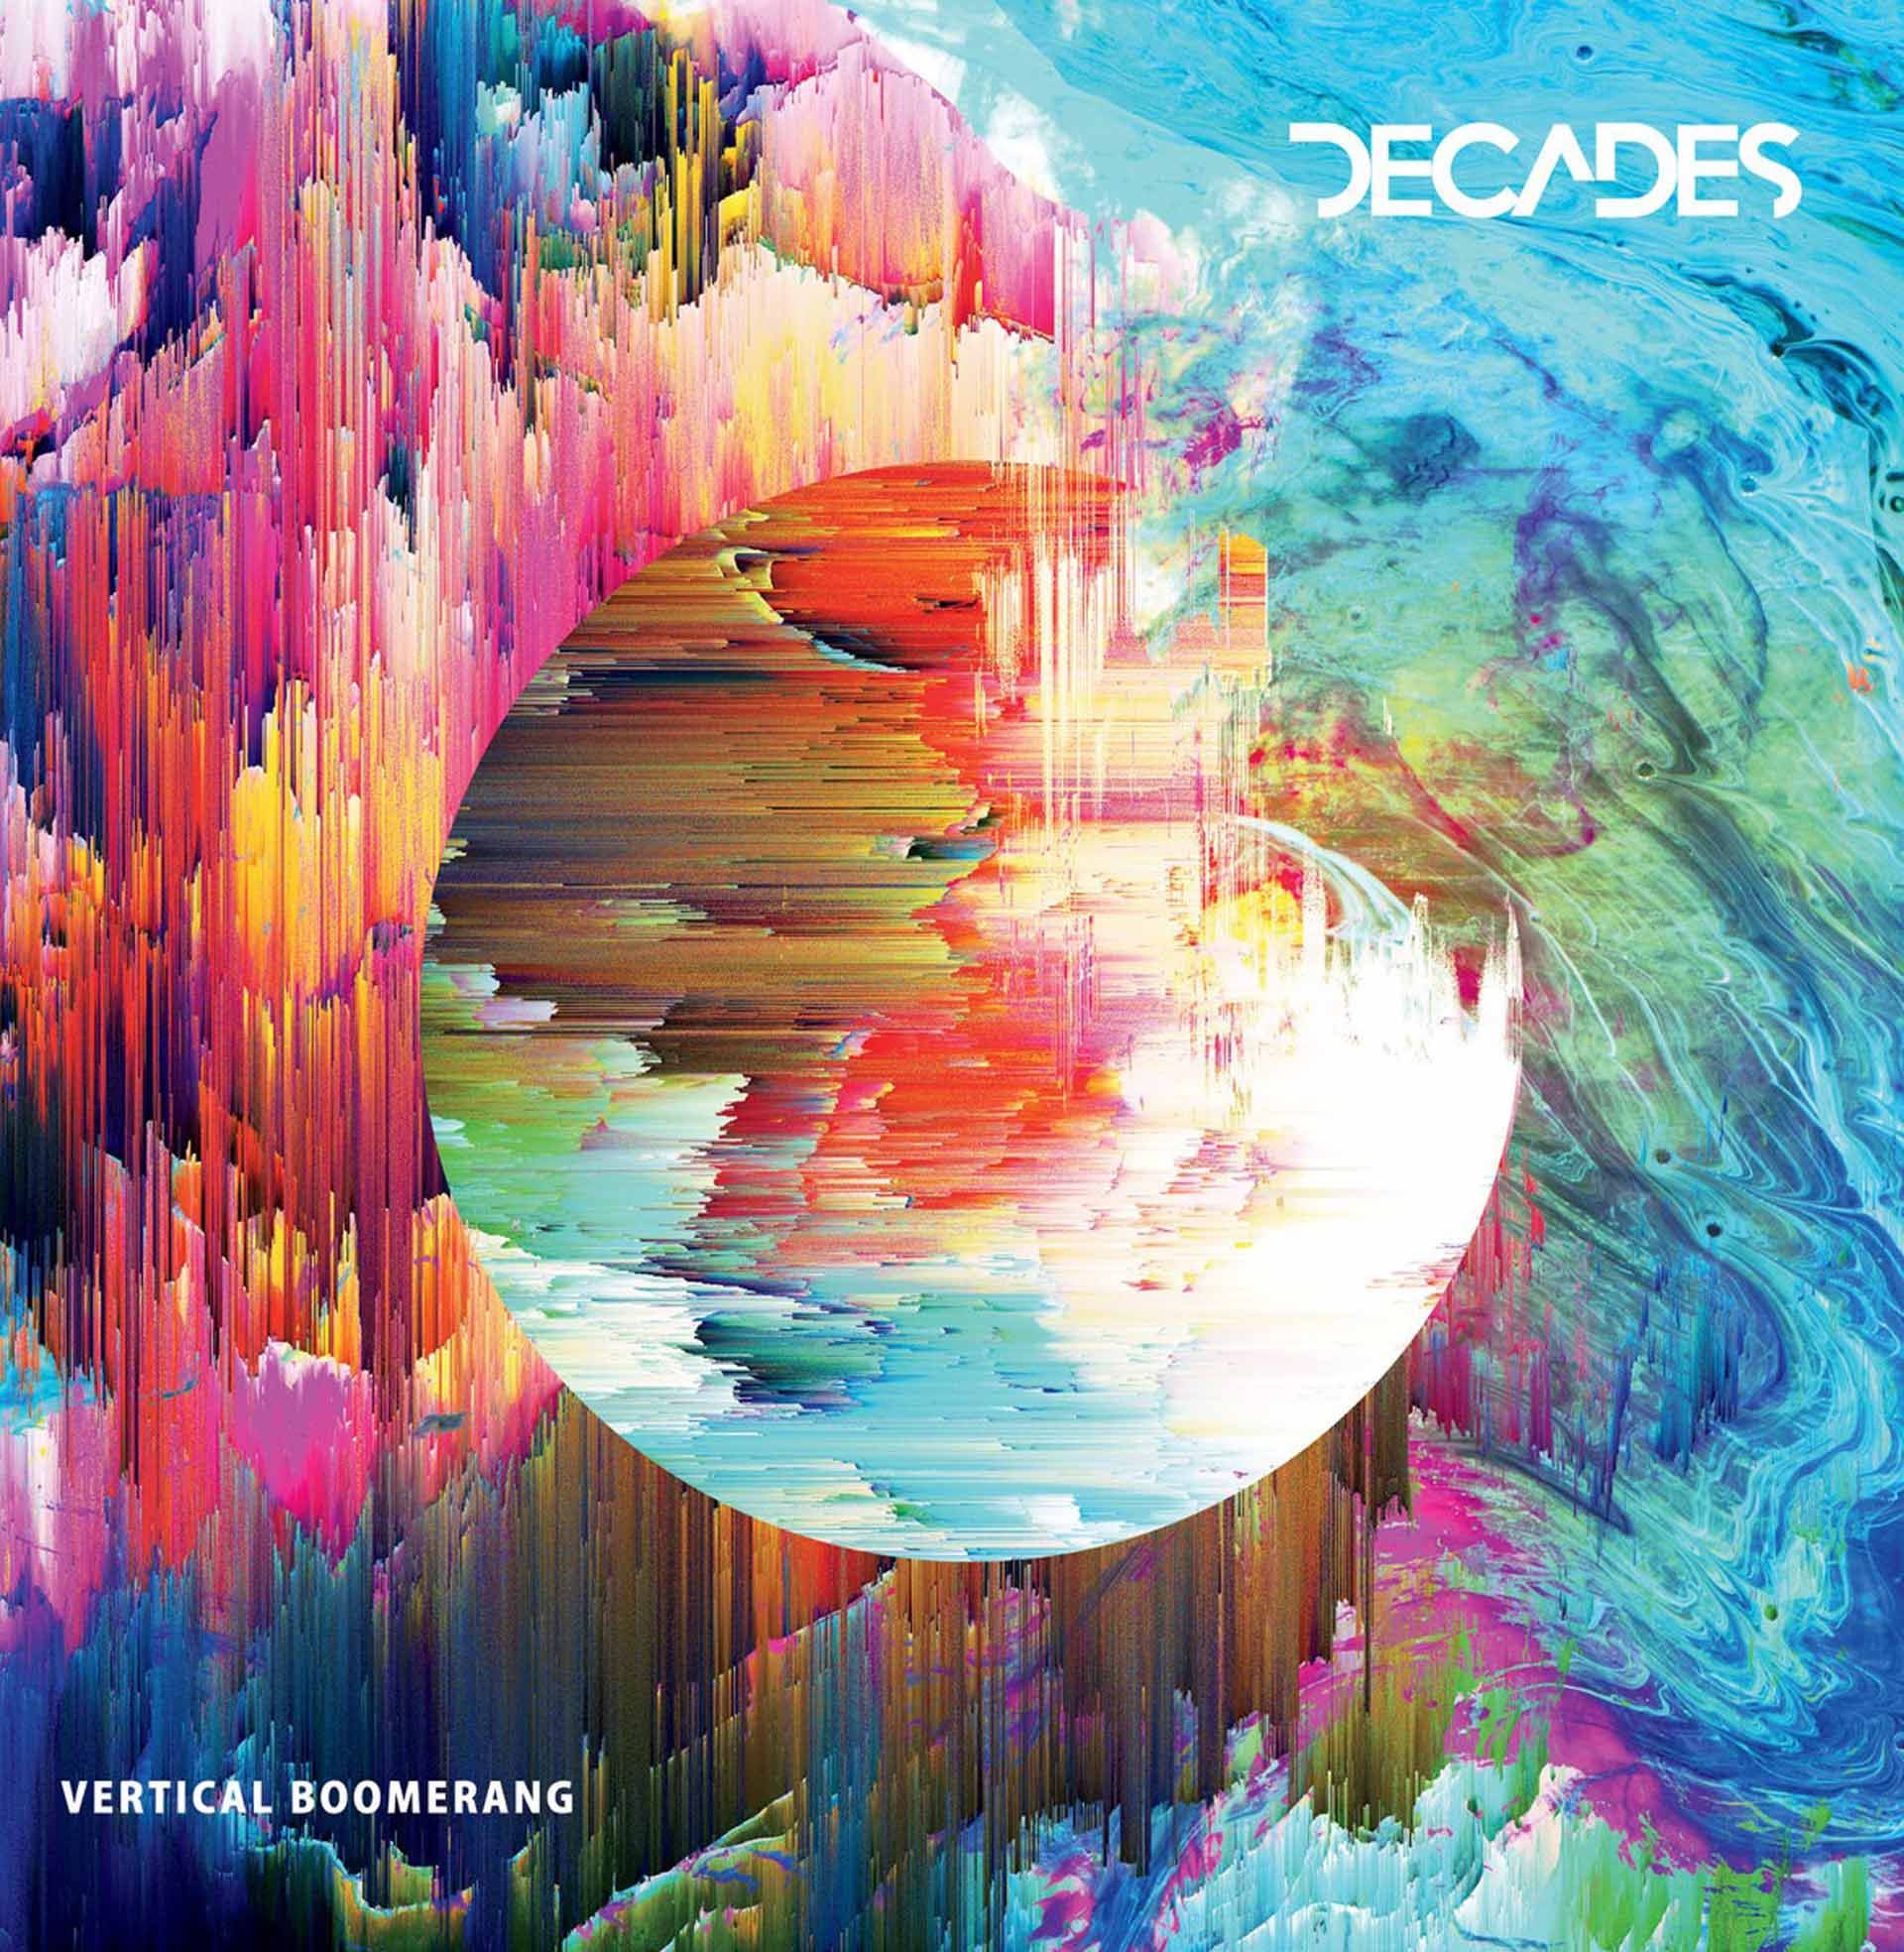 Vertical Boomerang  - EP (2018)  iTunes -  https://itunes.apple.com/us/album/vertical-boomerang-single/1340735049  Spotify -  https://open.spotify.com/album/6MYUawMacwlX5LUdUXycNC?si=6w640B9-R_K4CRPagZSUOQ  Bandcamp -  https://decadesbandmusic.bandcamp.com/